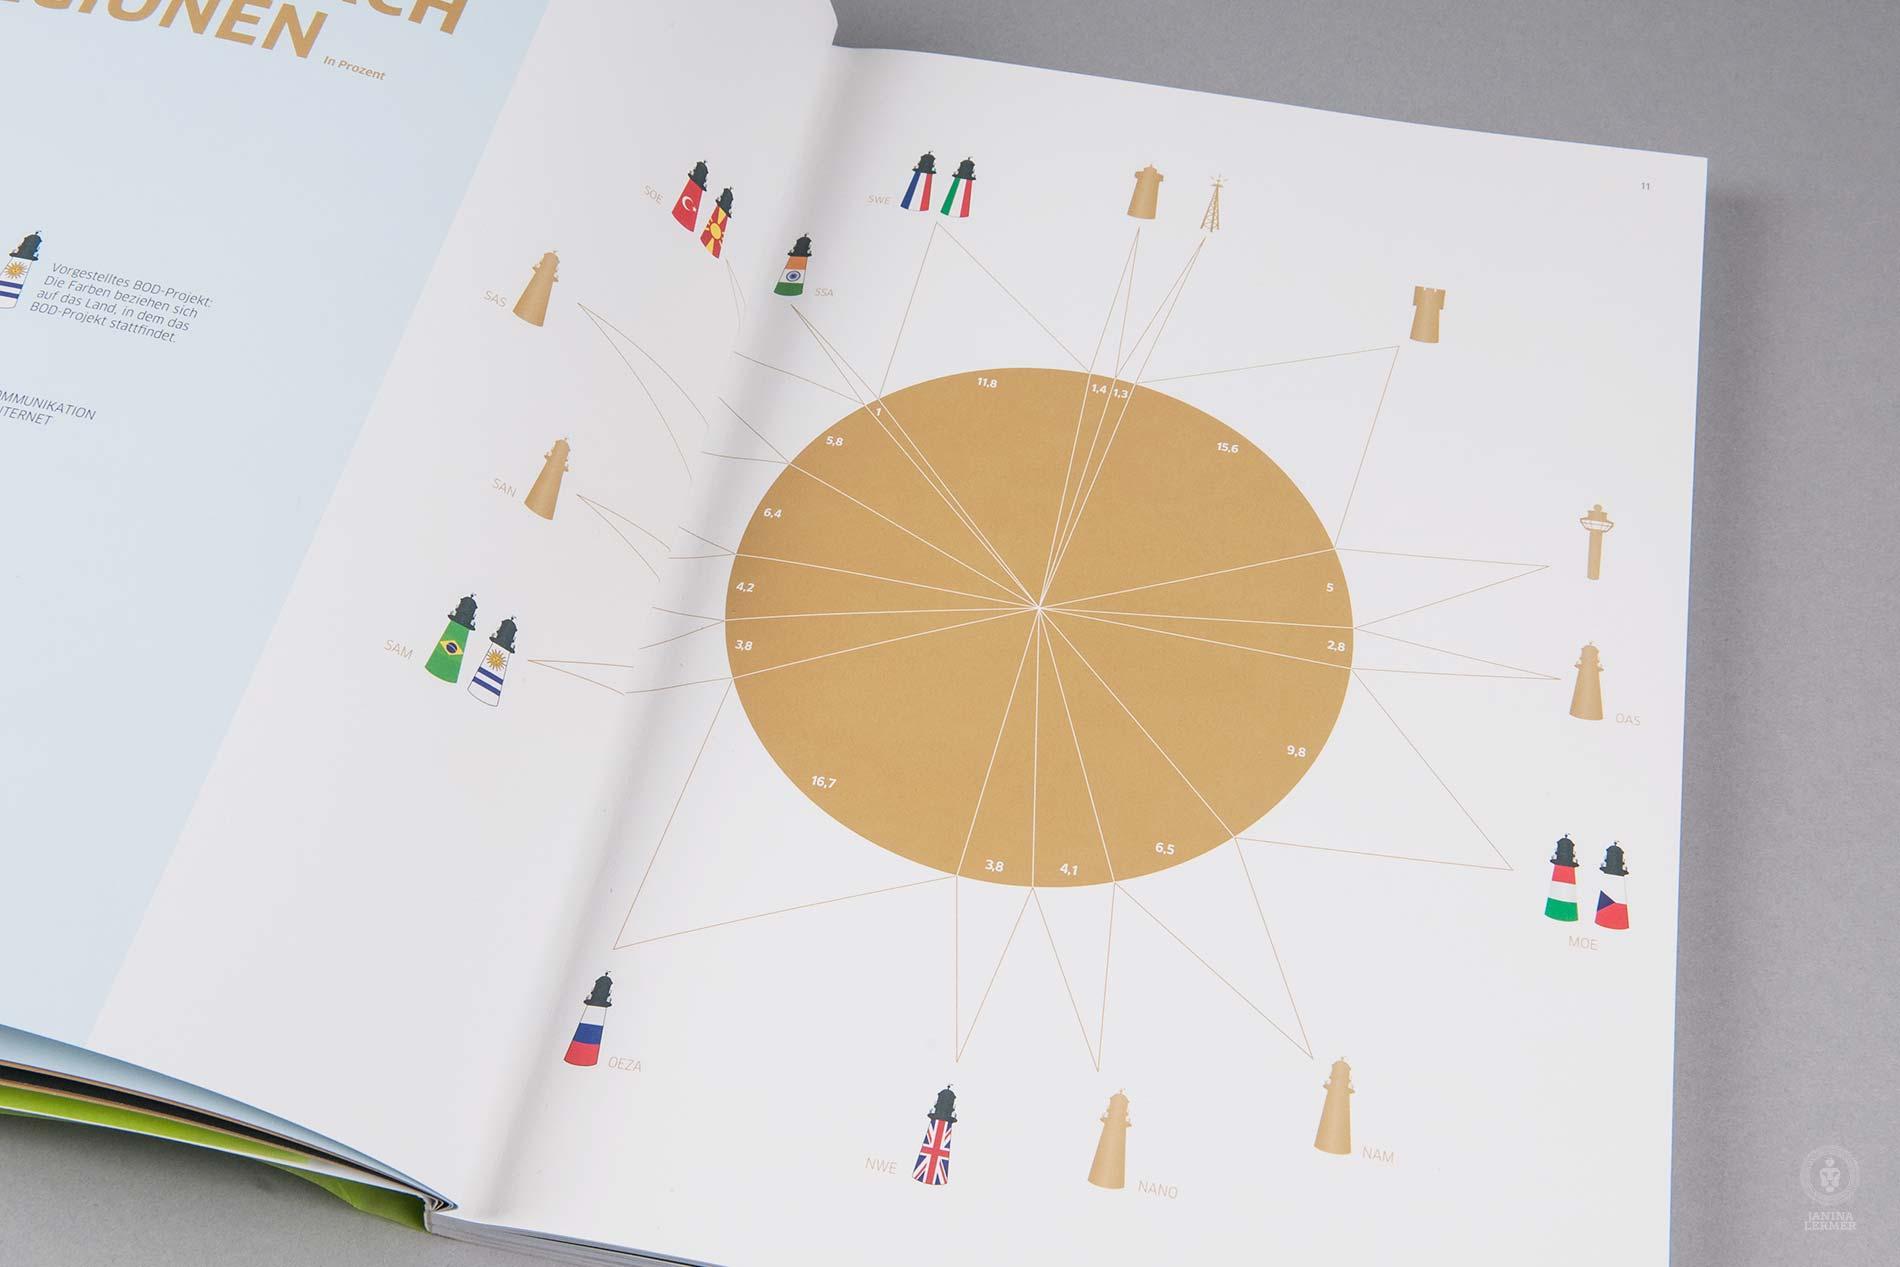 Janina-Lermer-Buchgestaltung-Magazingestaltung-Editorialdesign-Infografik-Lighthouse-optic-2-Goethe_Institut